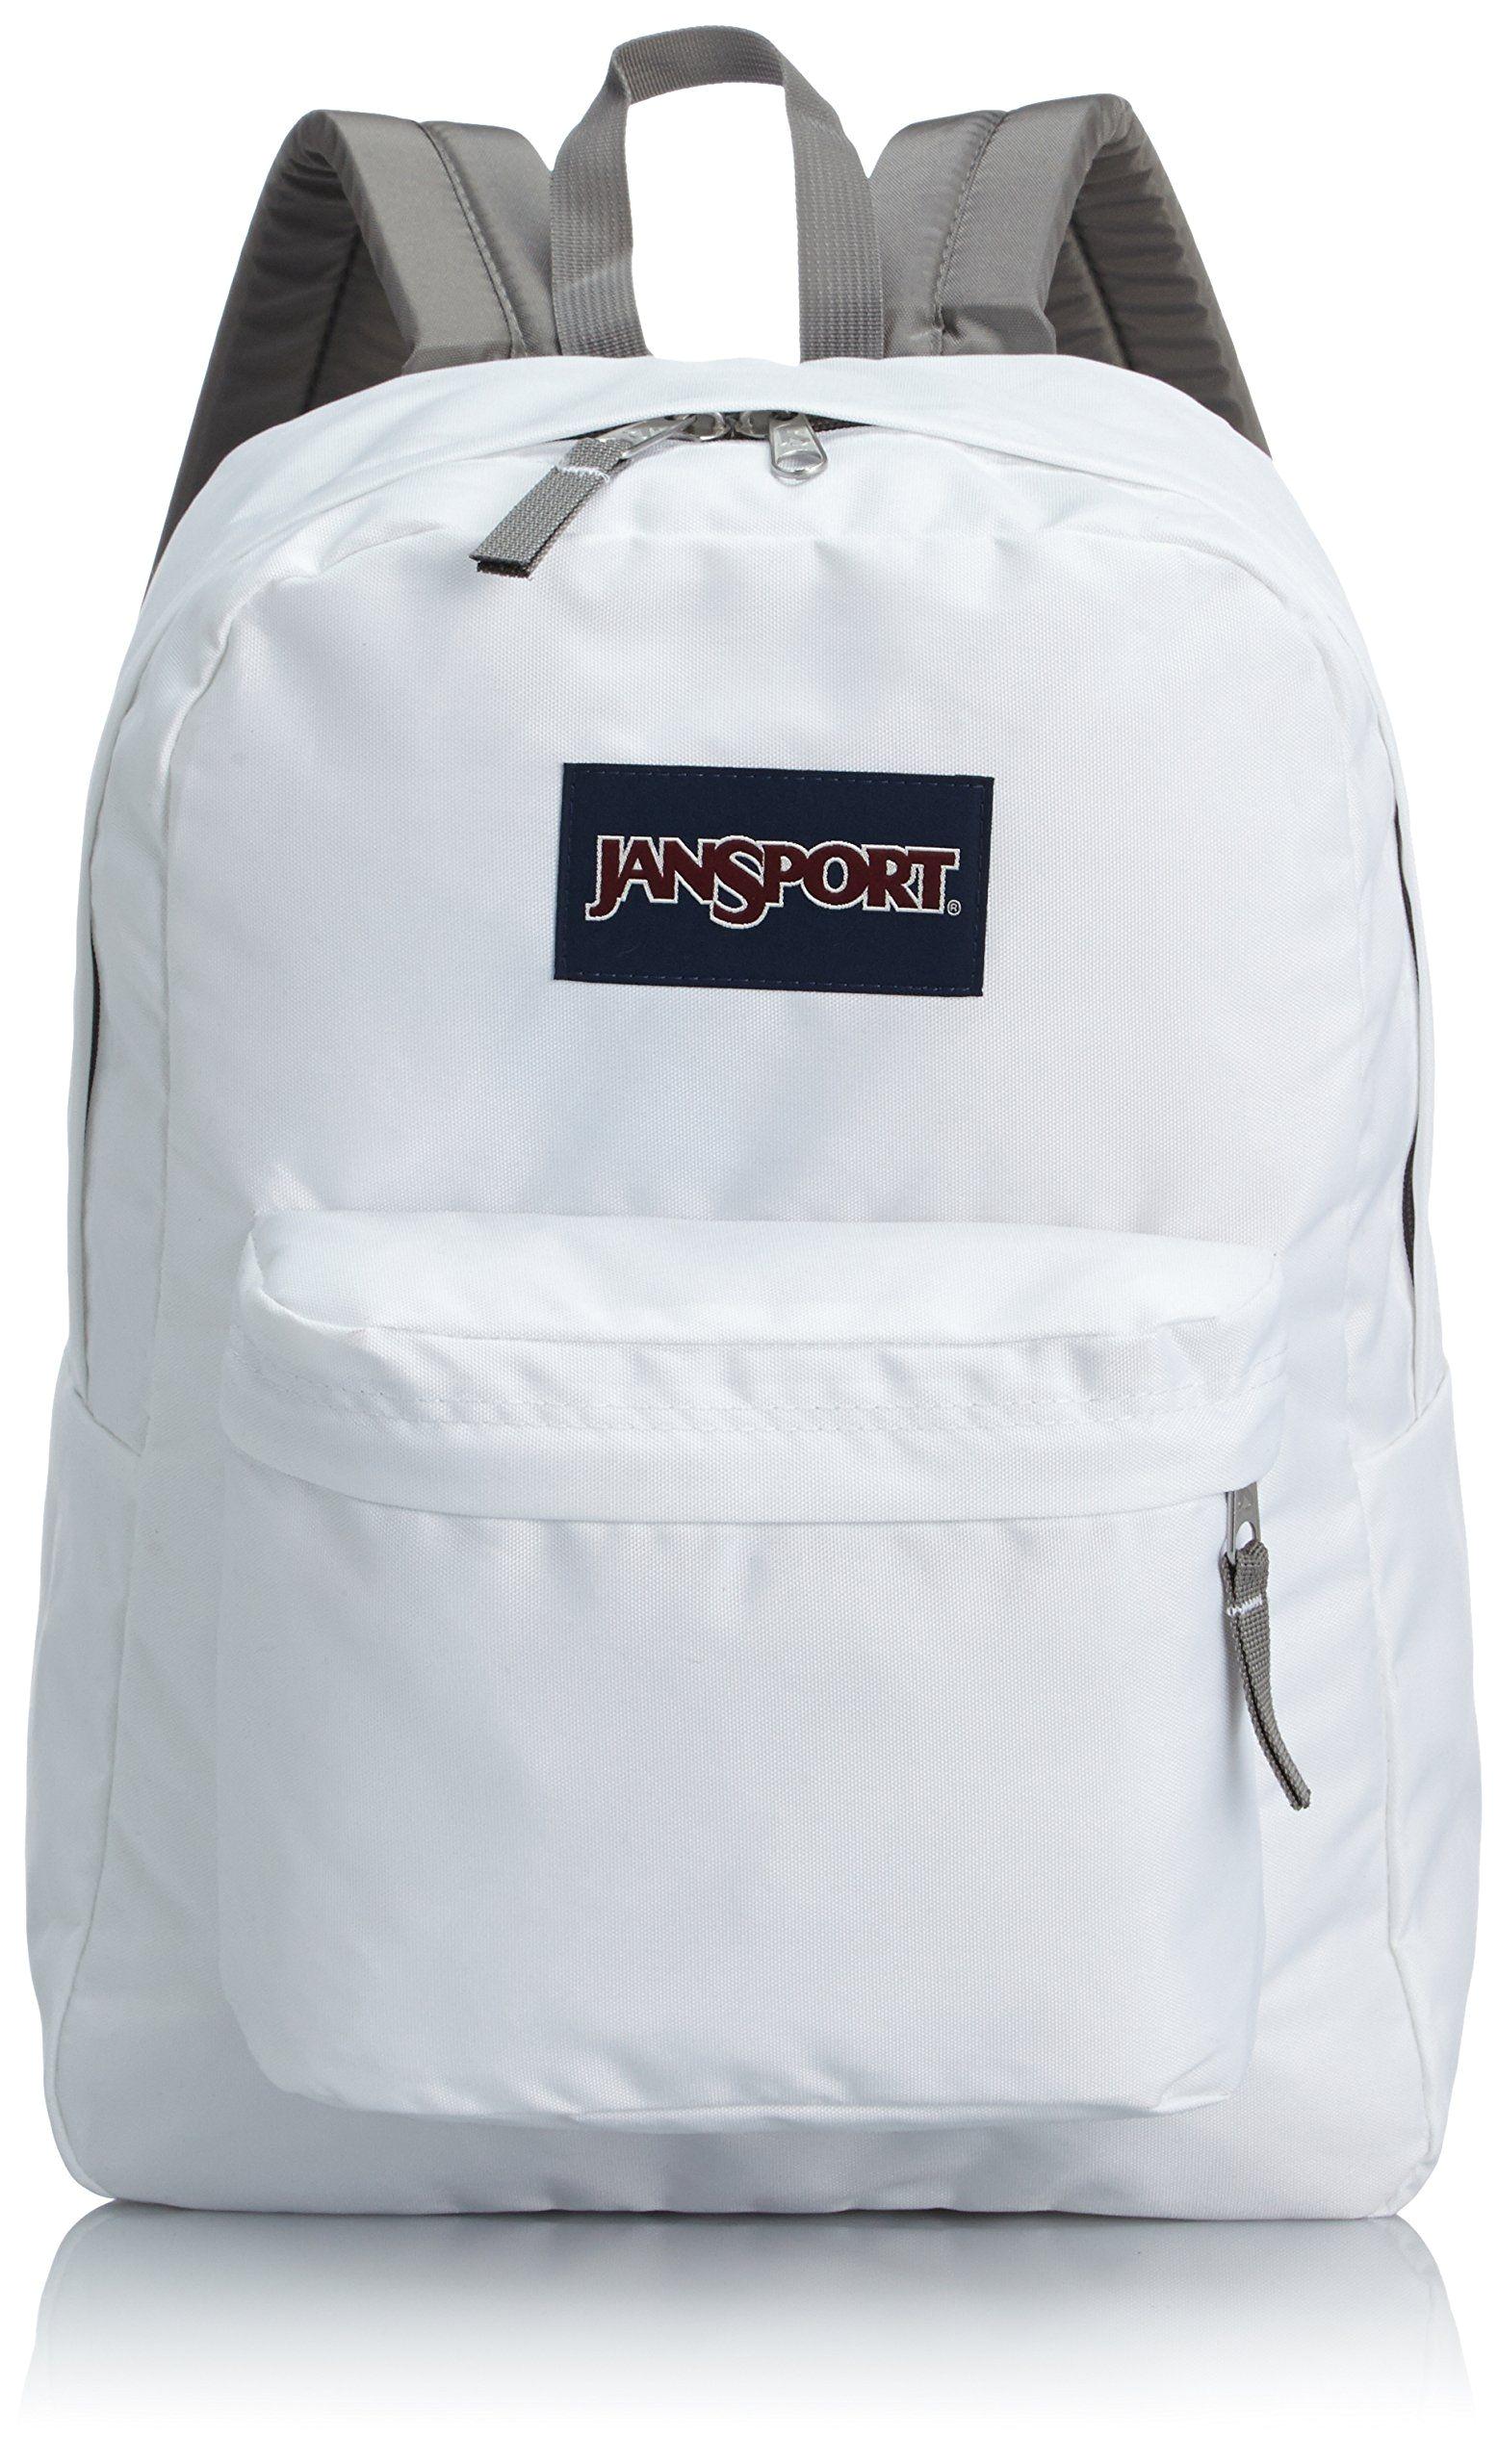 amazon com jansport superbreak backpack white jansport clothing student